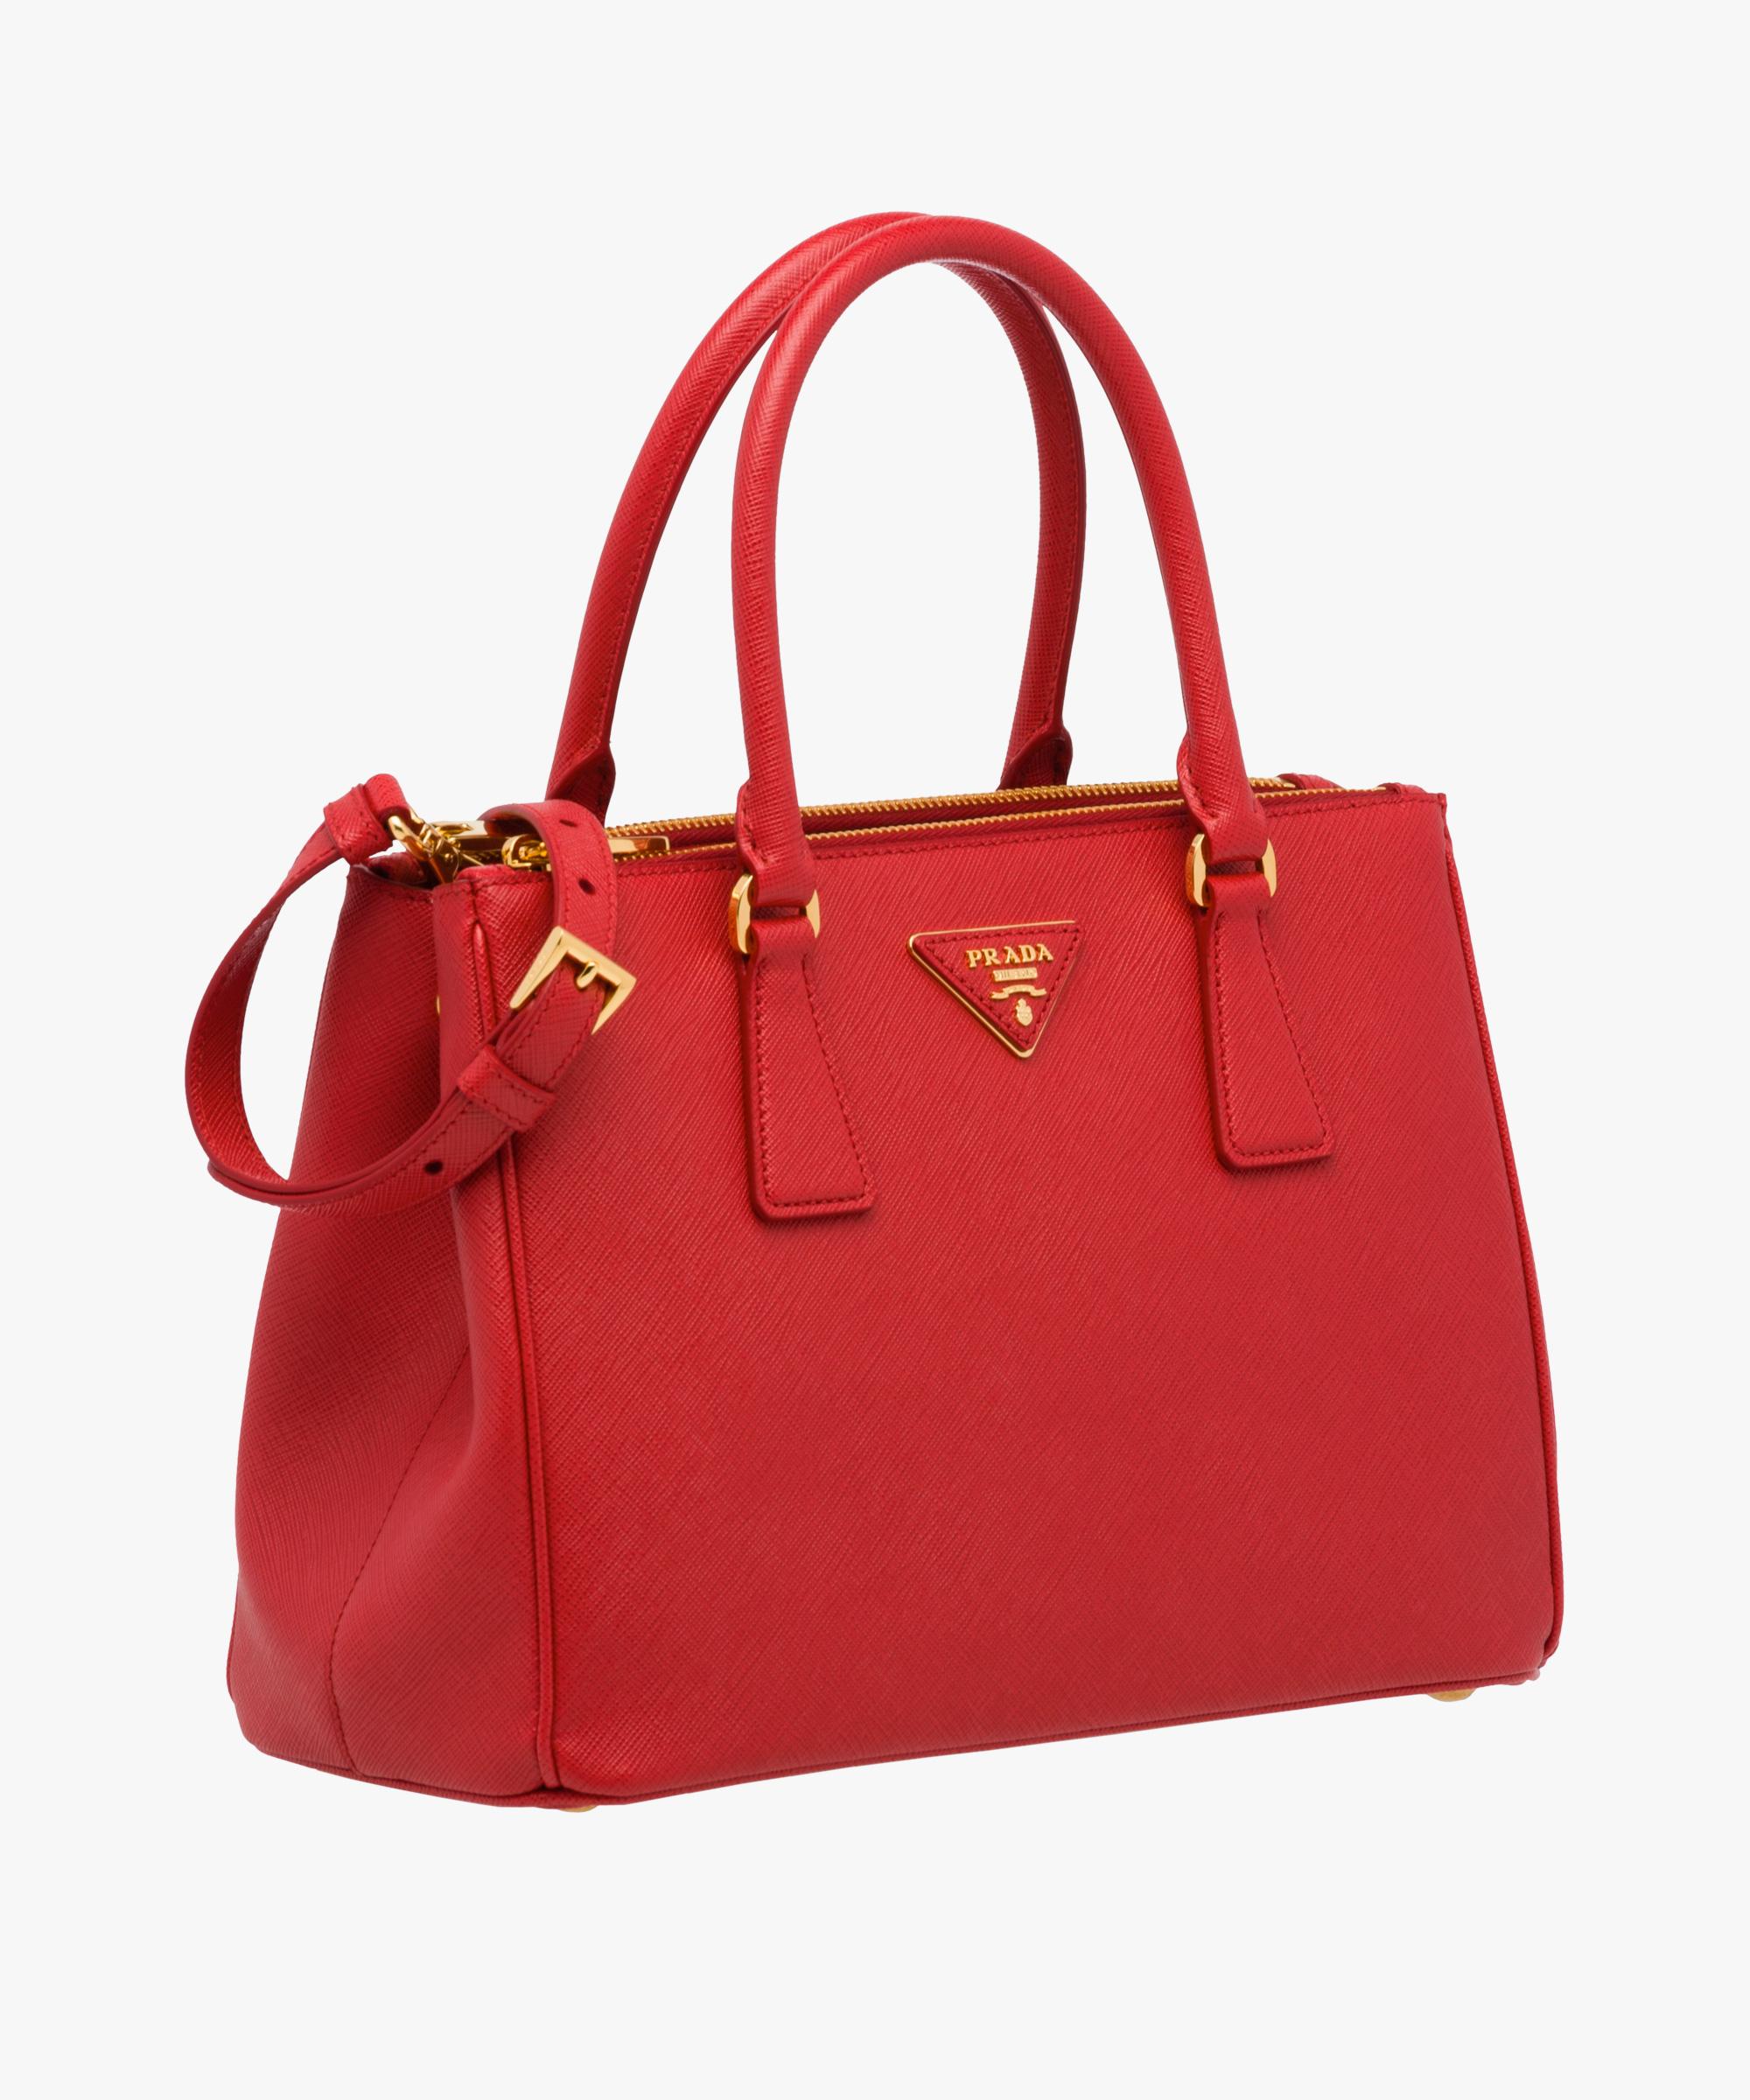 a5508814f9 ... Prada Galleria Small Saffiano Leather Bag Prada FIERY RED ...